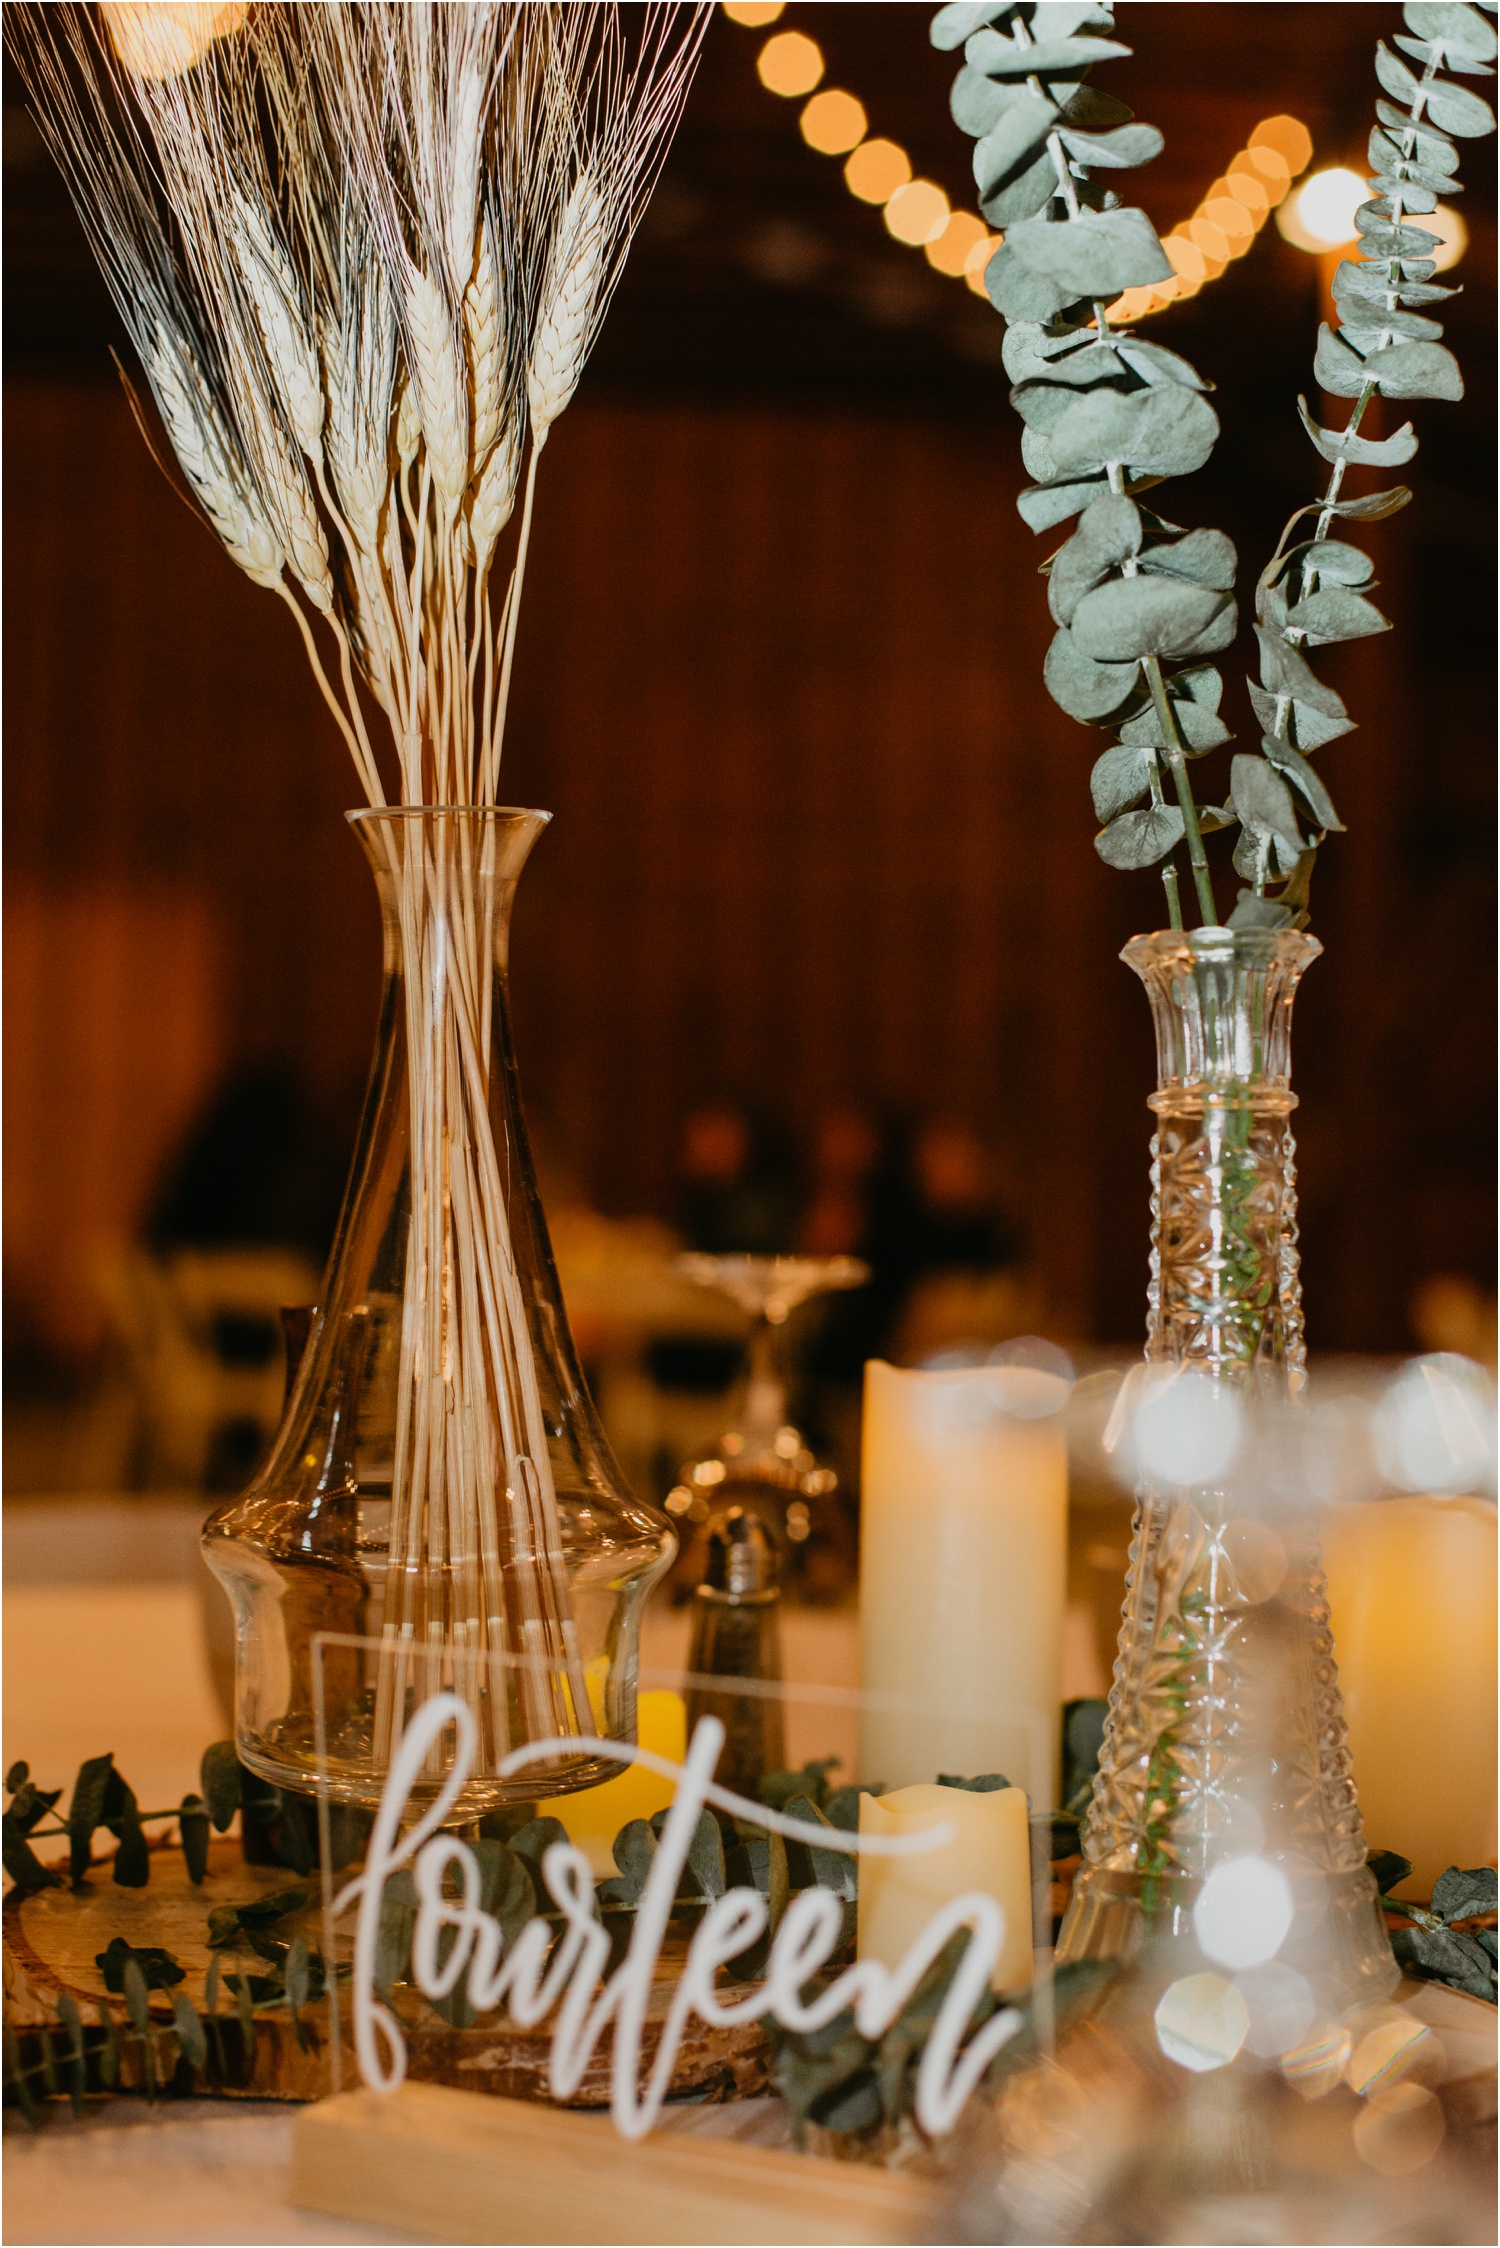 Courtney Jess Photography,Fernie Photographer,Fernie Wedding Photographer,Kimberley BC Weddings,Kimberley bc photographer,Vanagon couple photos,Volkswagon Van,boho couples.,east kootenay photographer,vanagon,